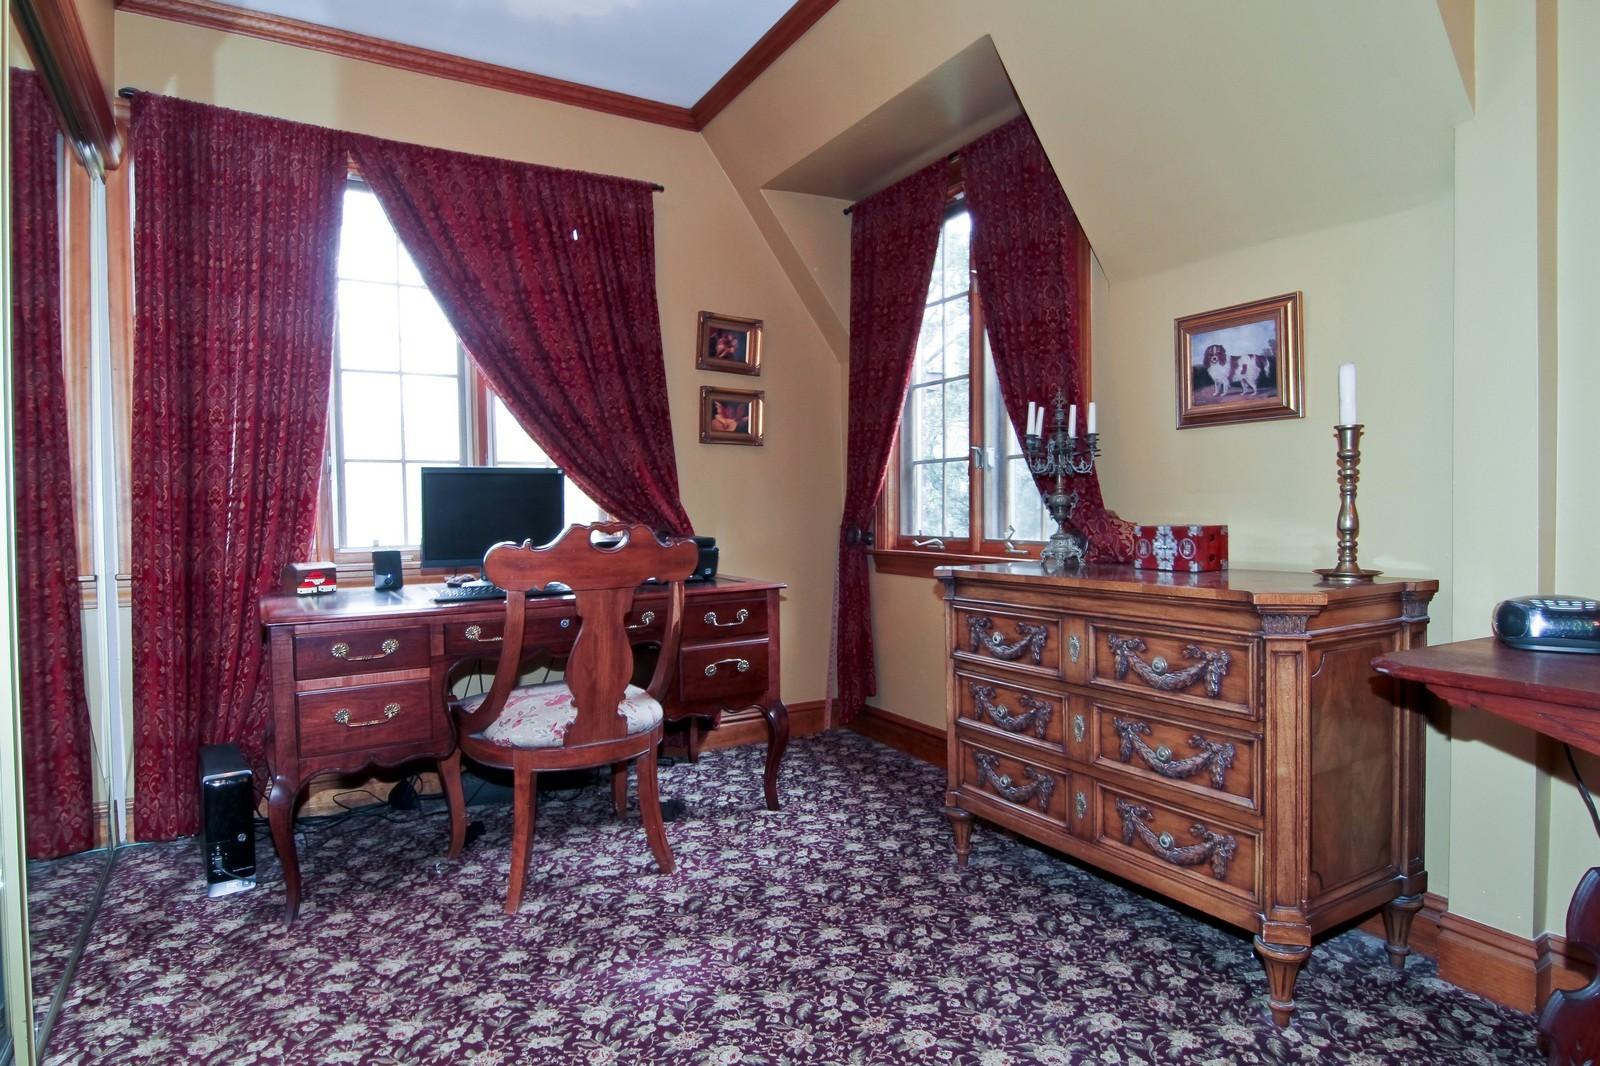 Real Estate Photography - 933 N Main, Glen Ellyn, IL, 60137 - Master Bedroom